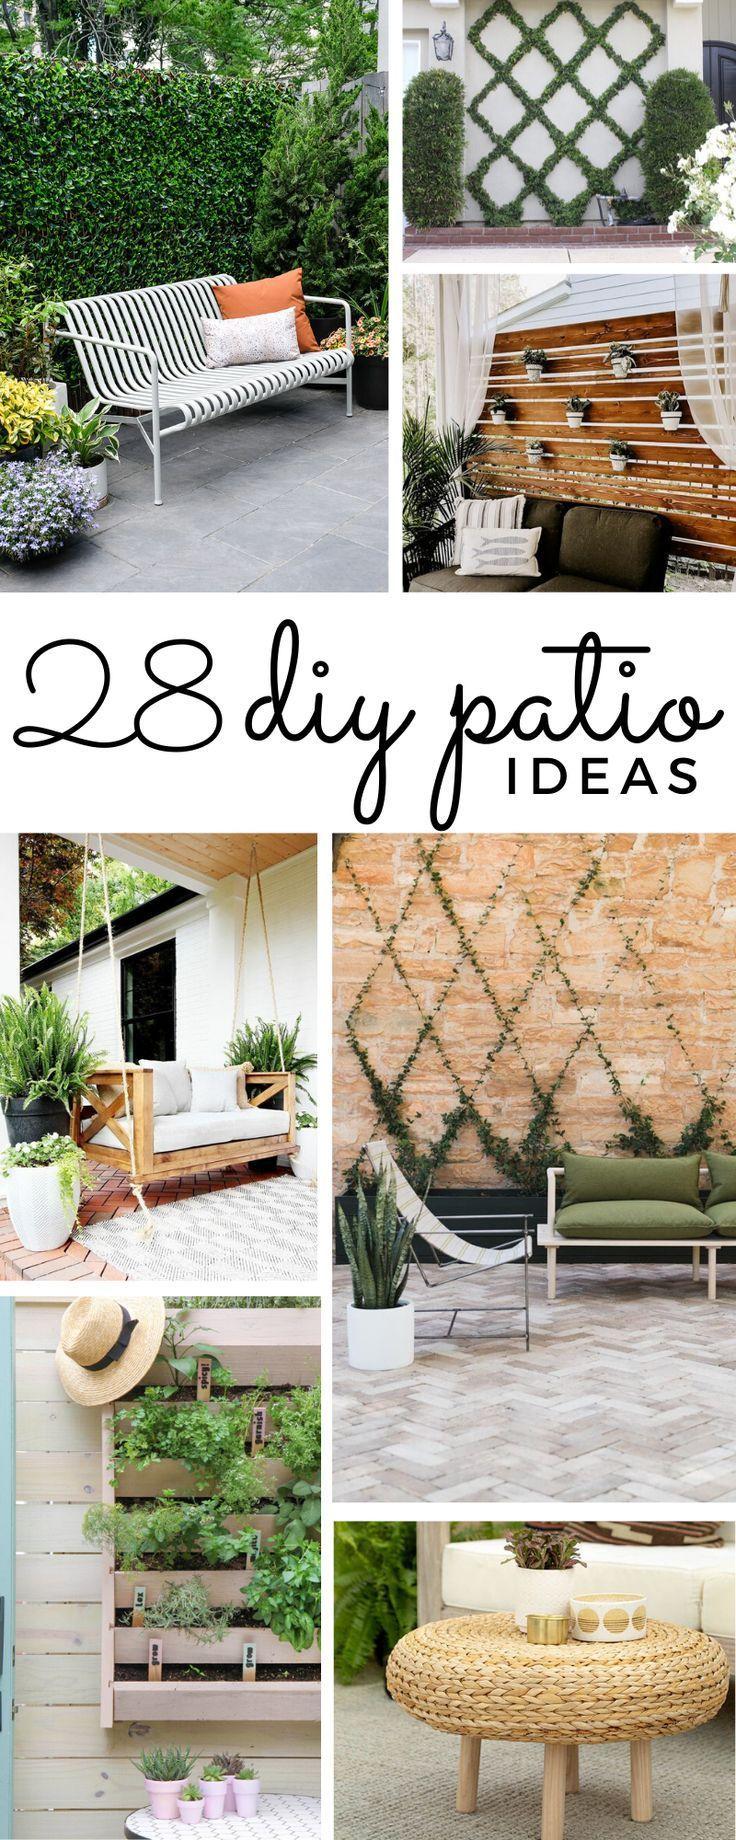 25+ Backyard deck ideas on a budget information